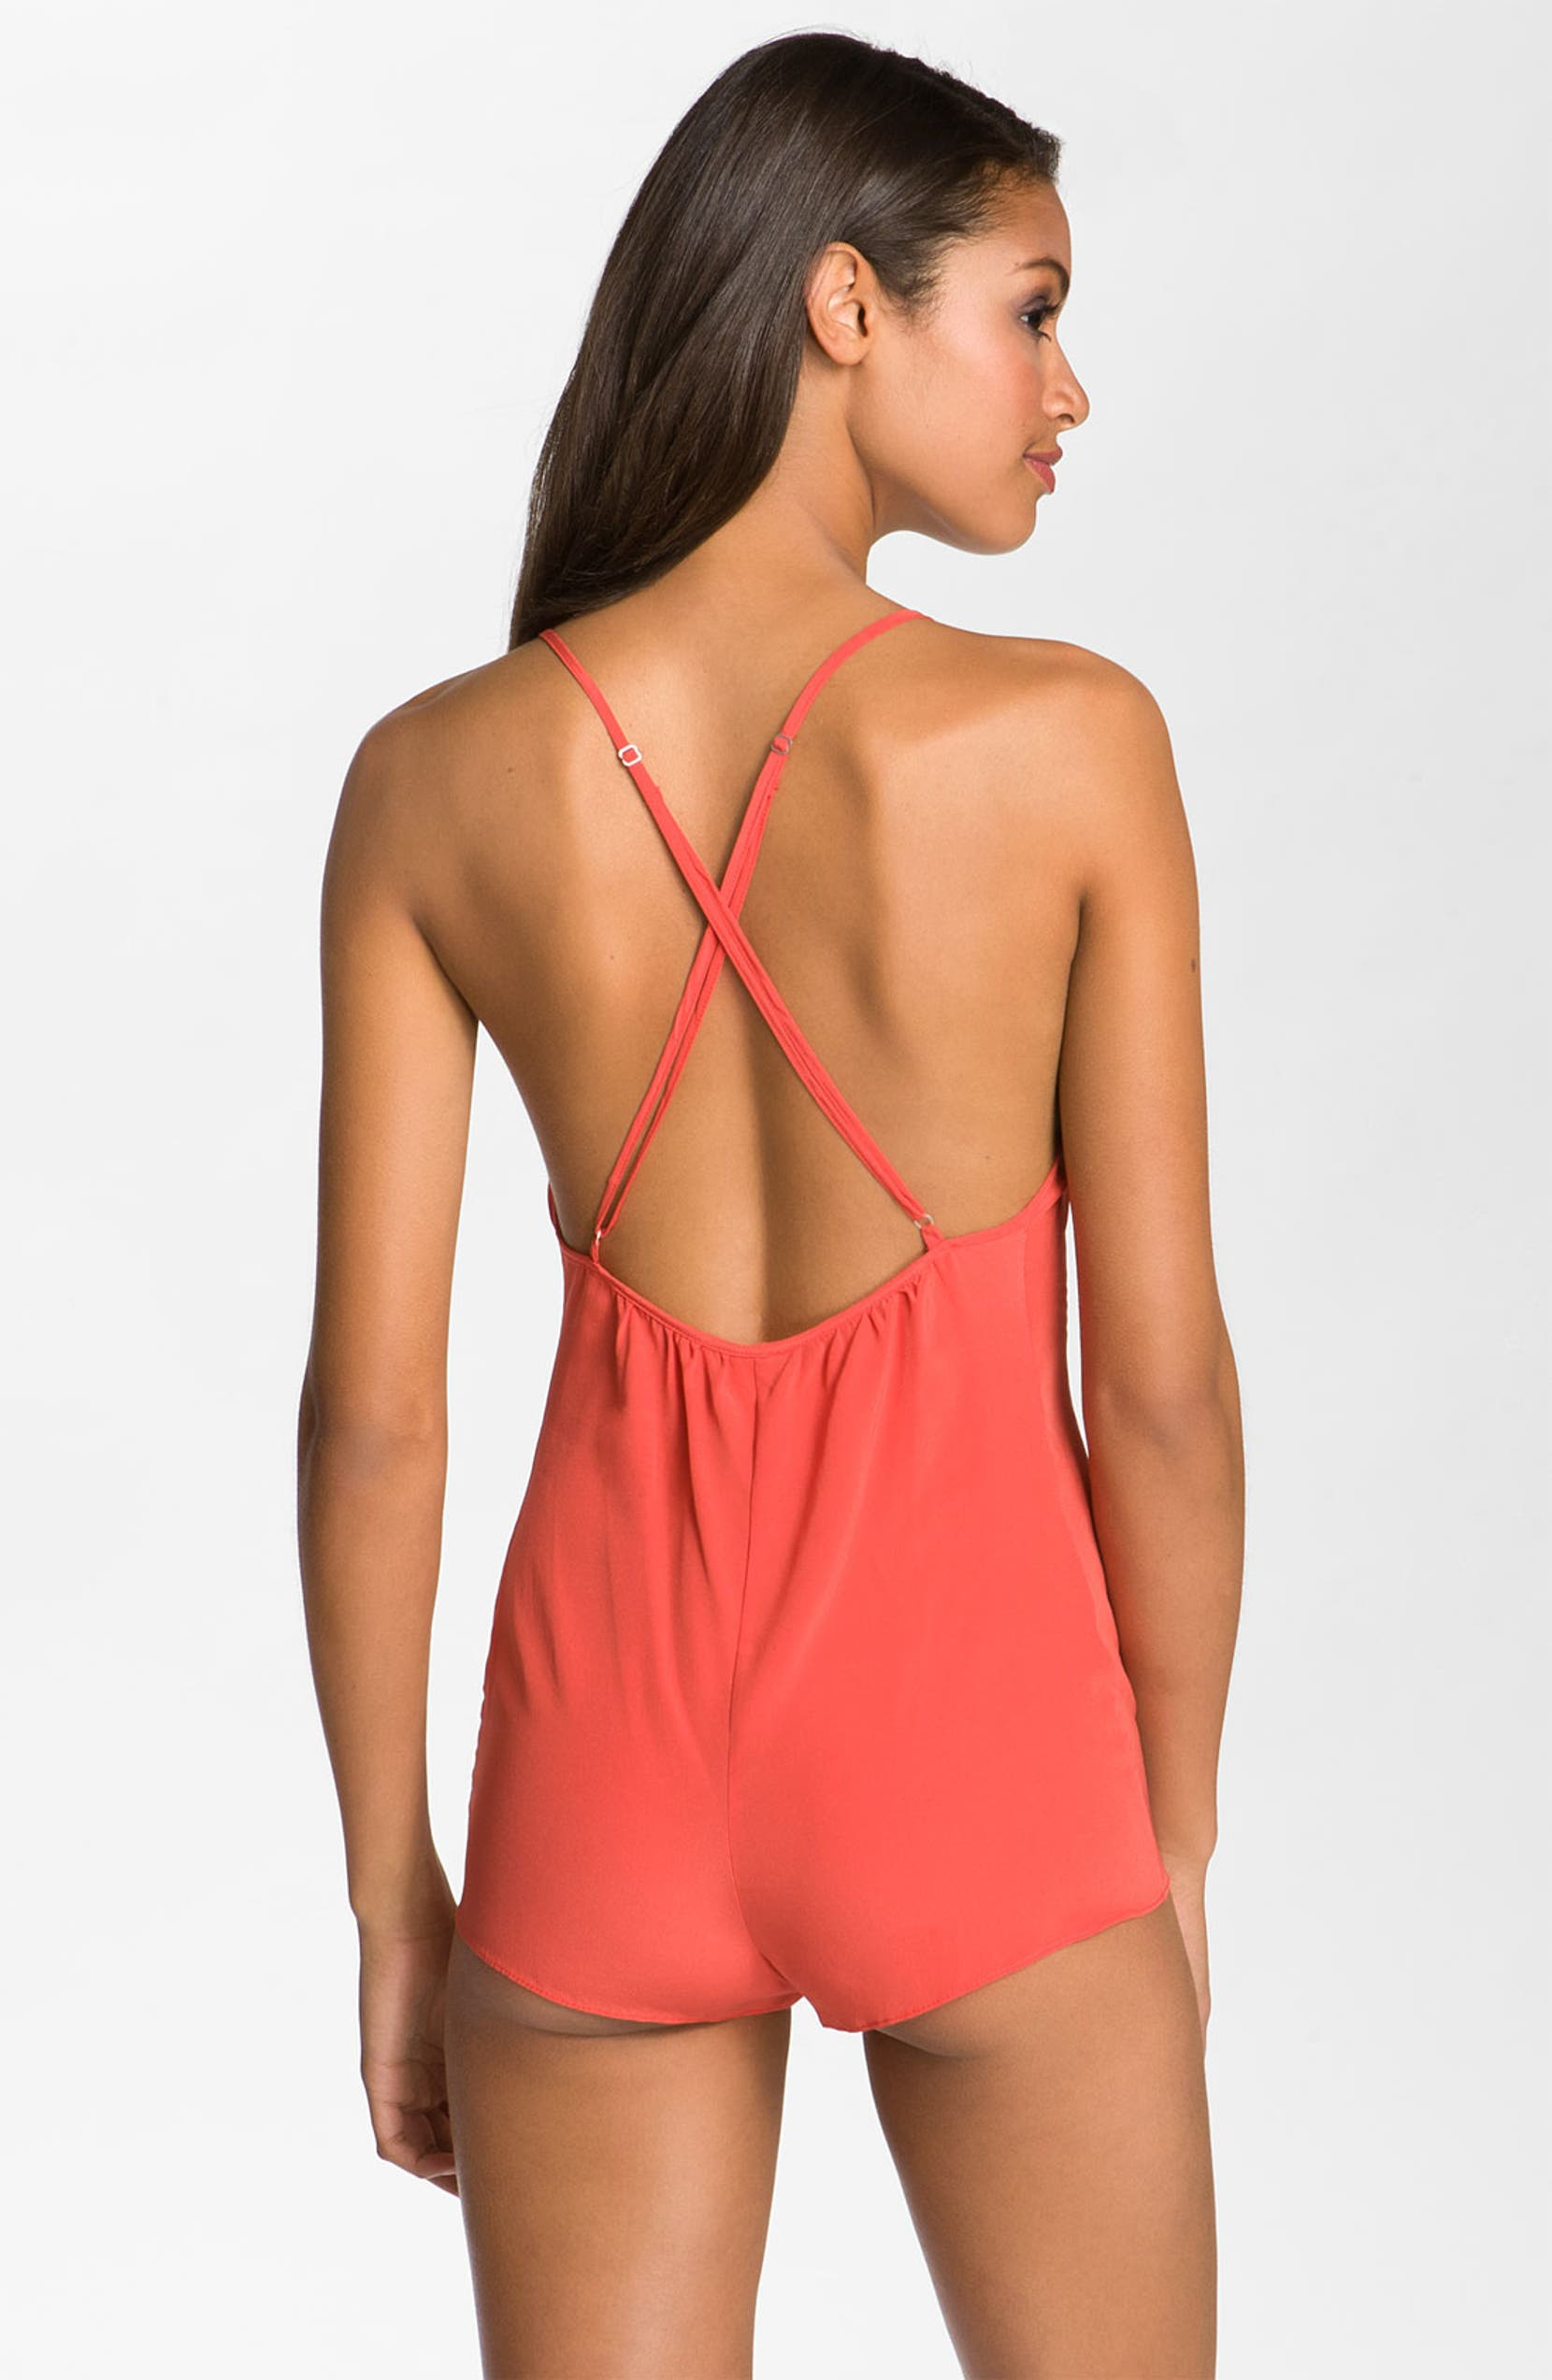 Zinke  XOXO  Silk Romper Pajamas  d158b5c8f